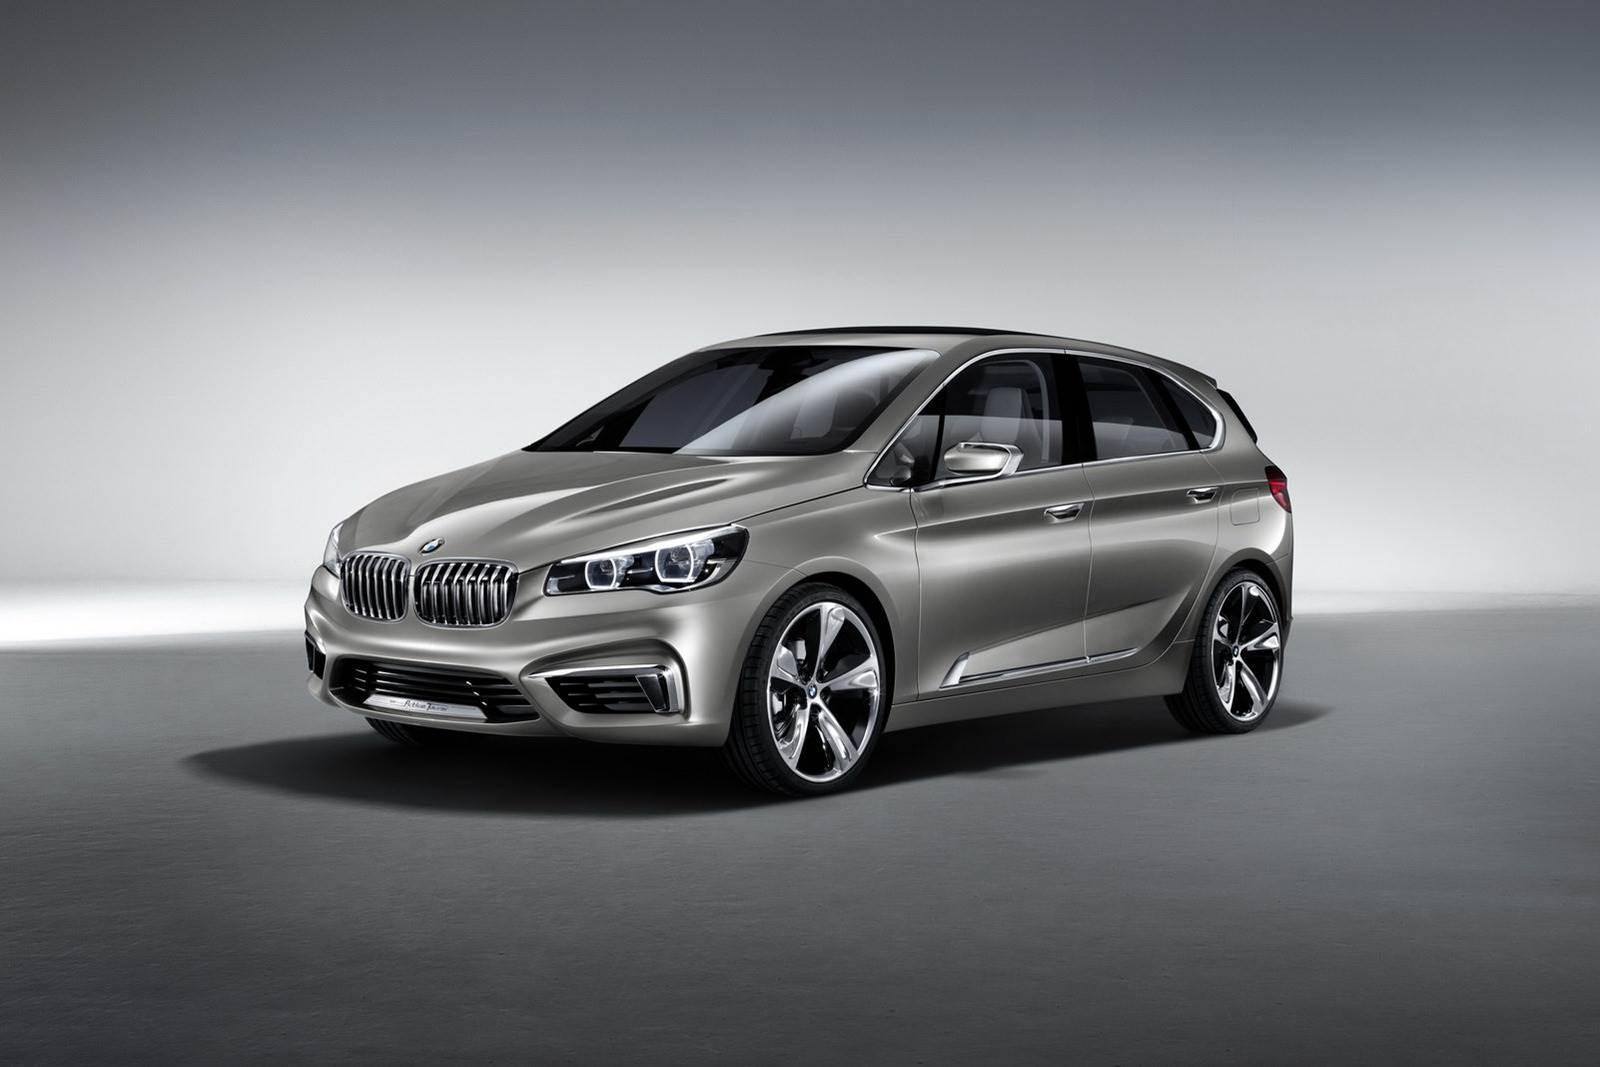 New BMW Active Tourer Concept